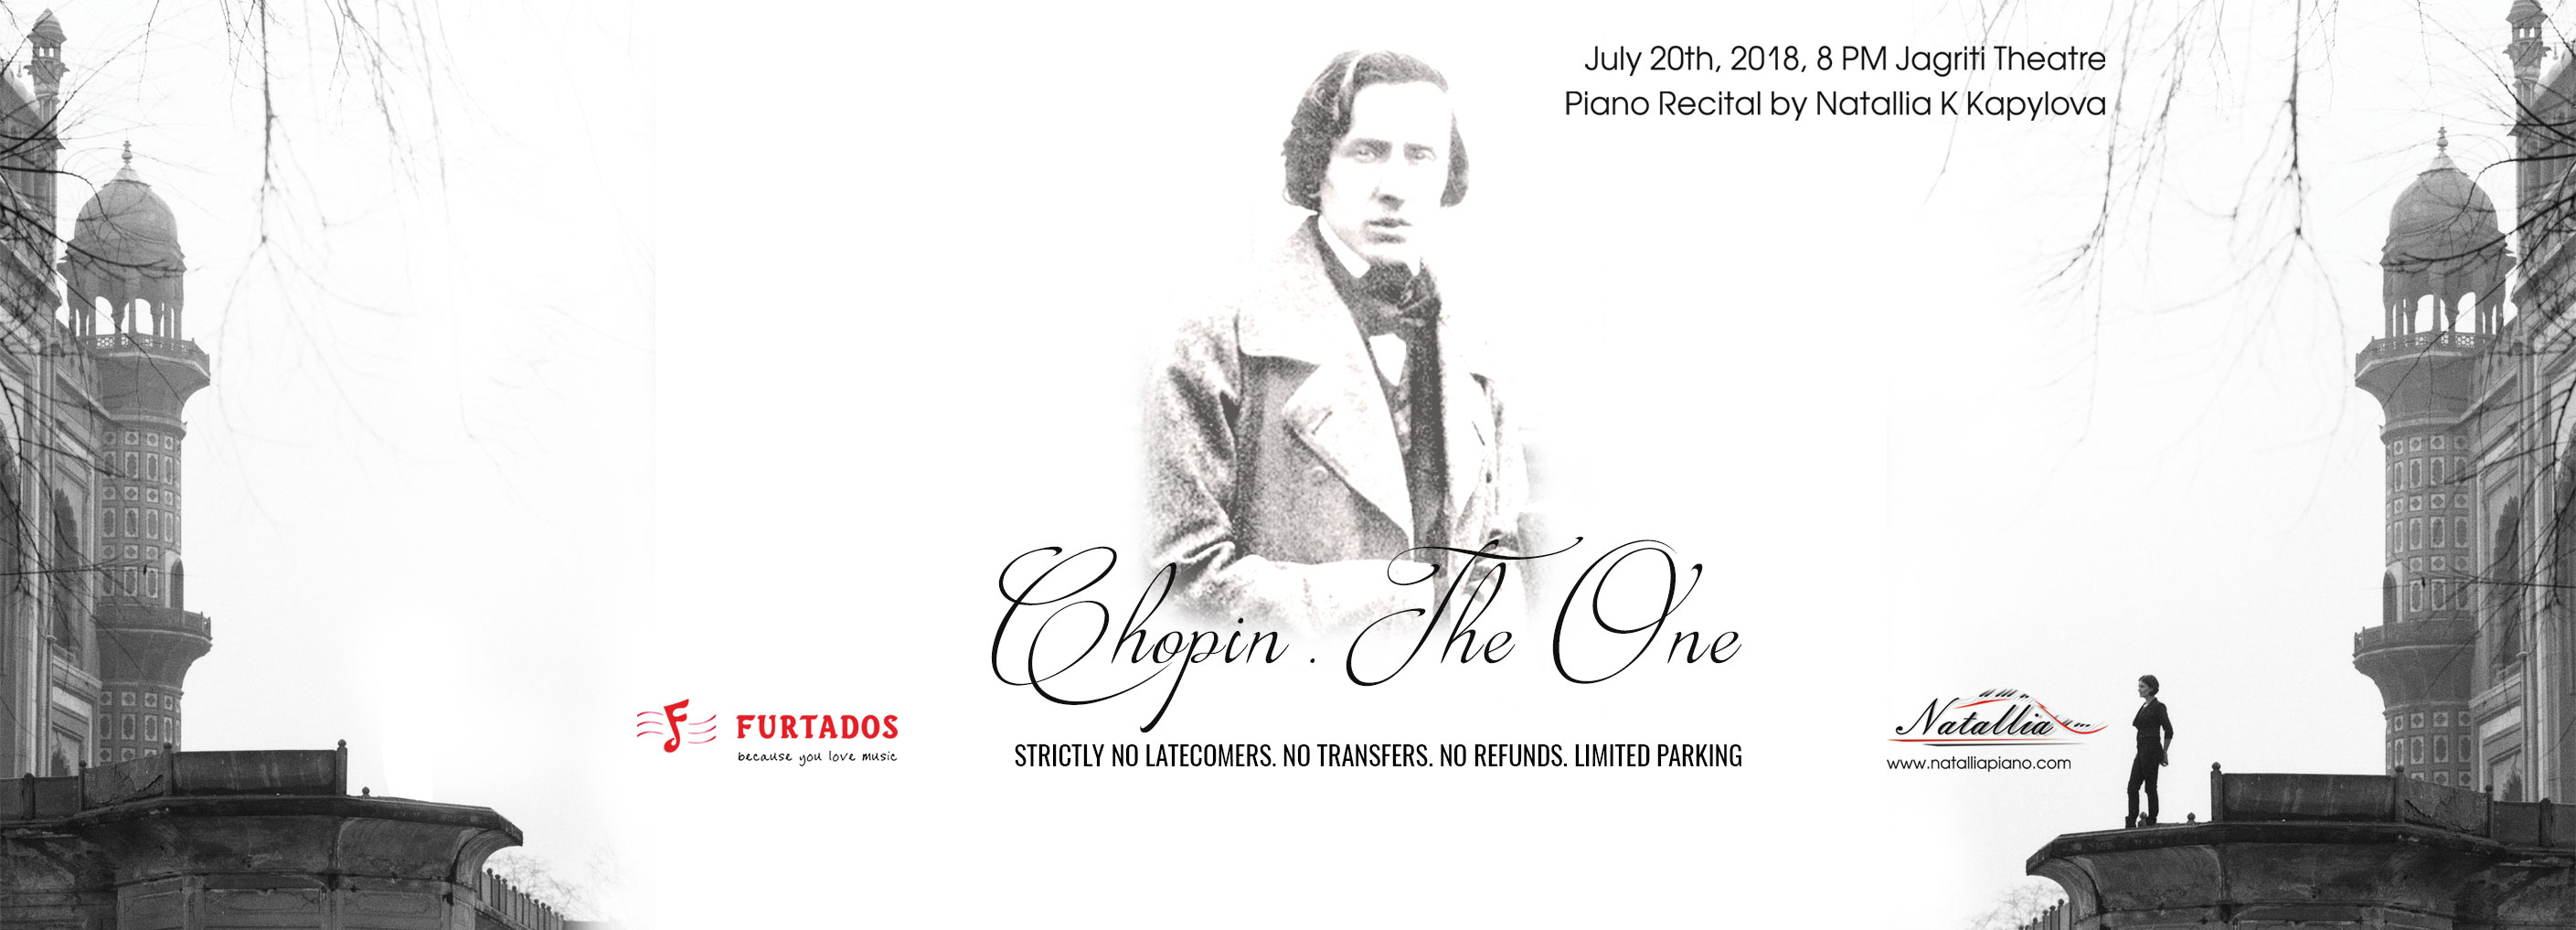 Chopin. The One: Piano Recital